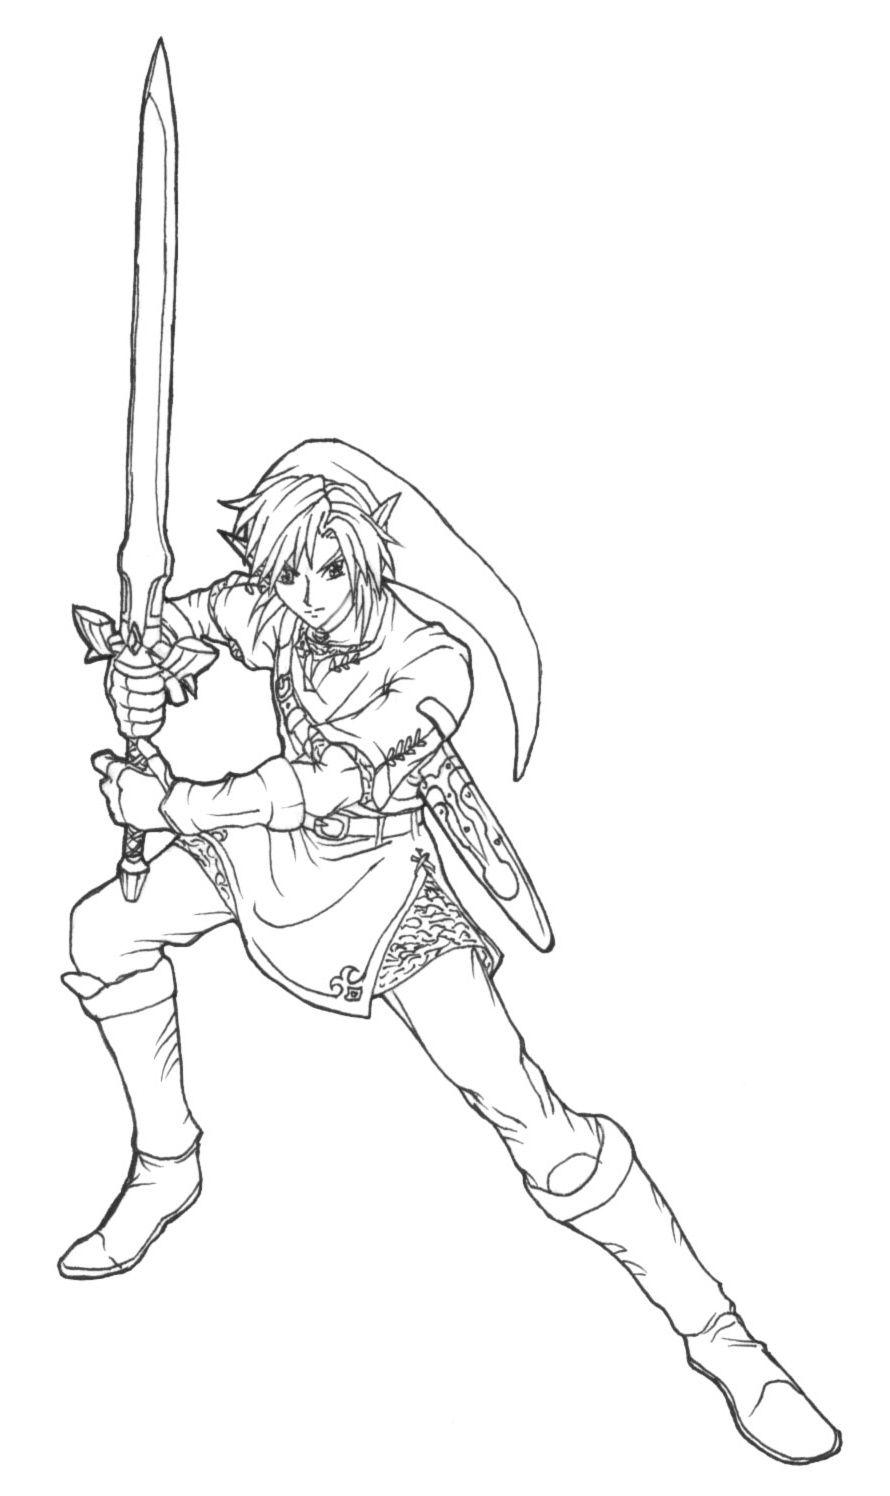 14 Elegant Zelda Coloriage Images Coloriage Zelda Dessin Zelda Coloriage